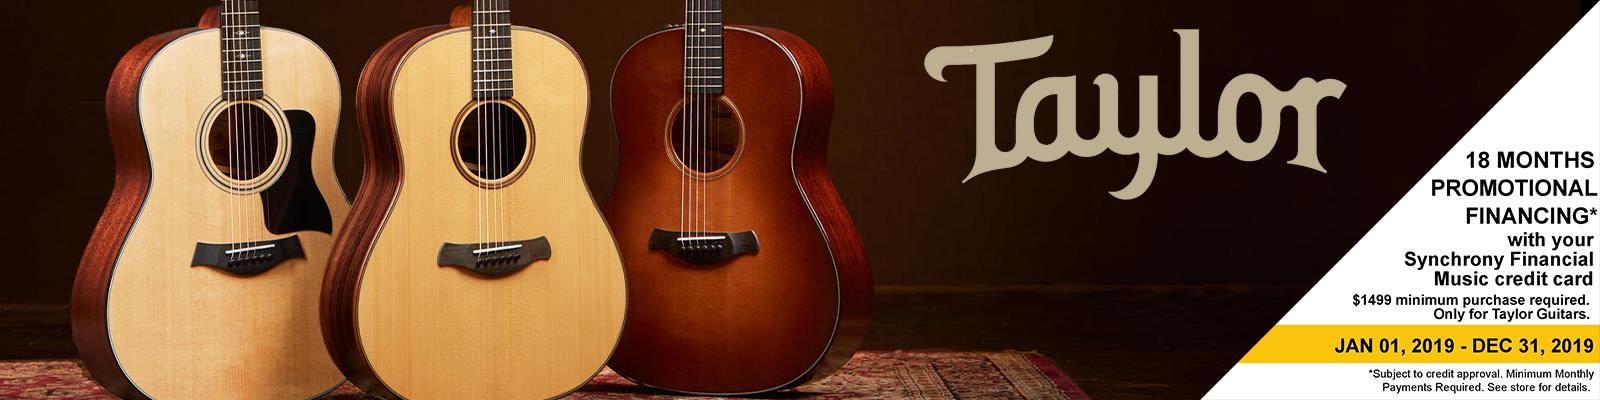 Taylor Guitar Financing